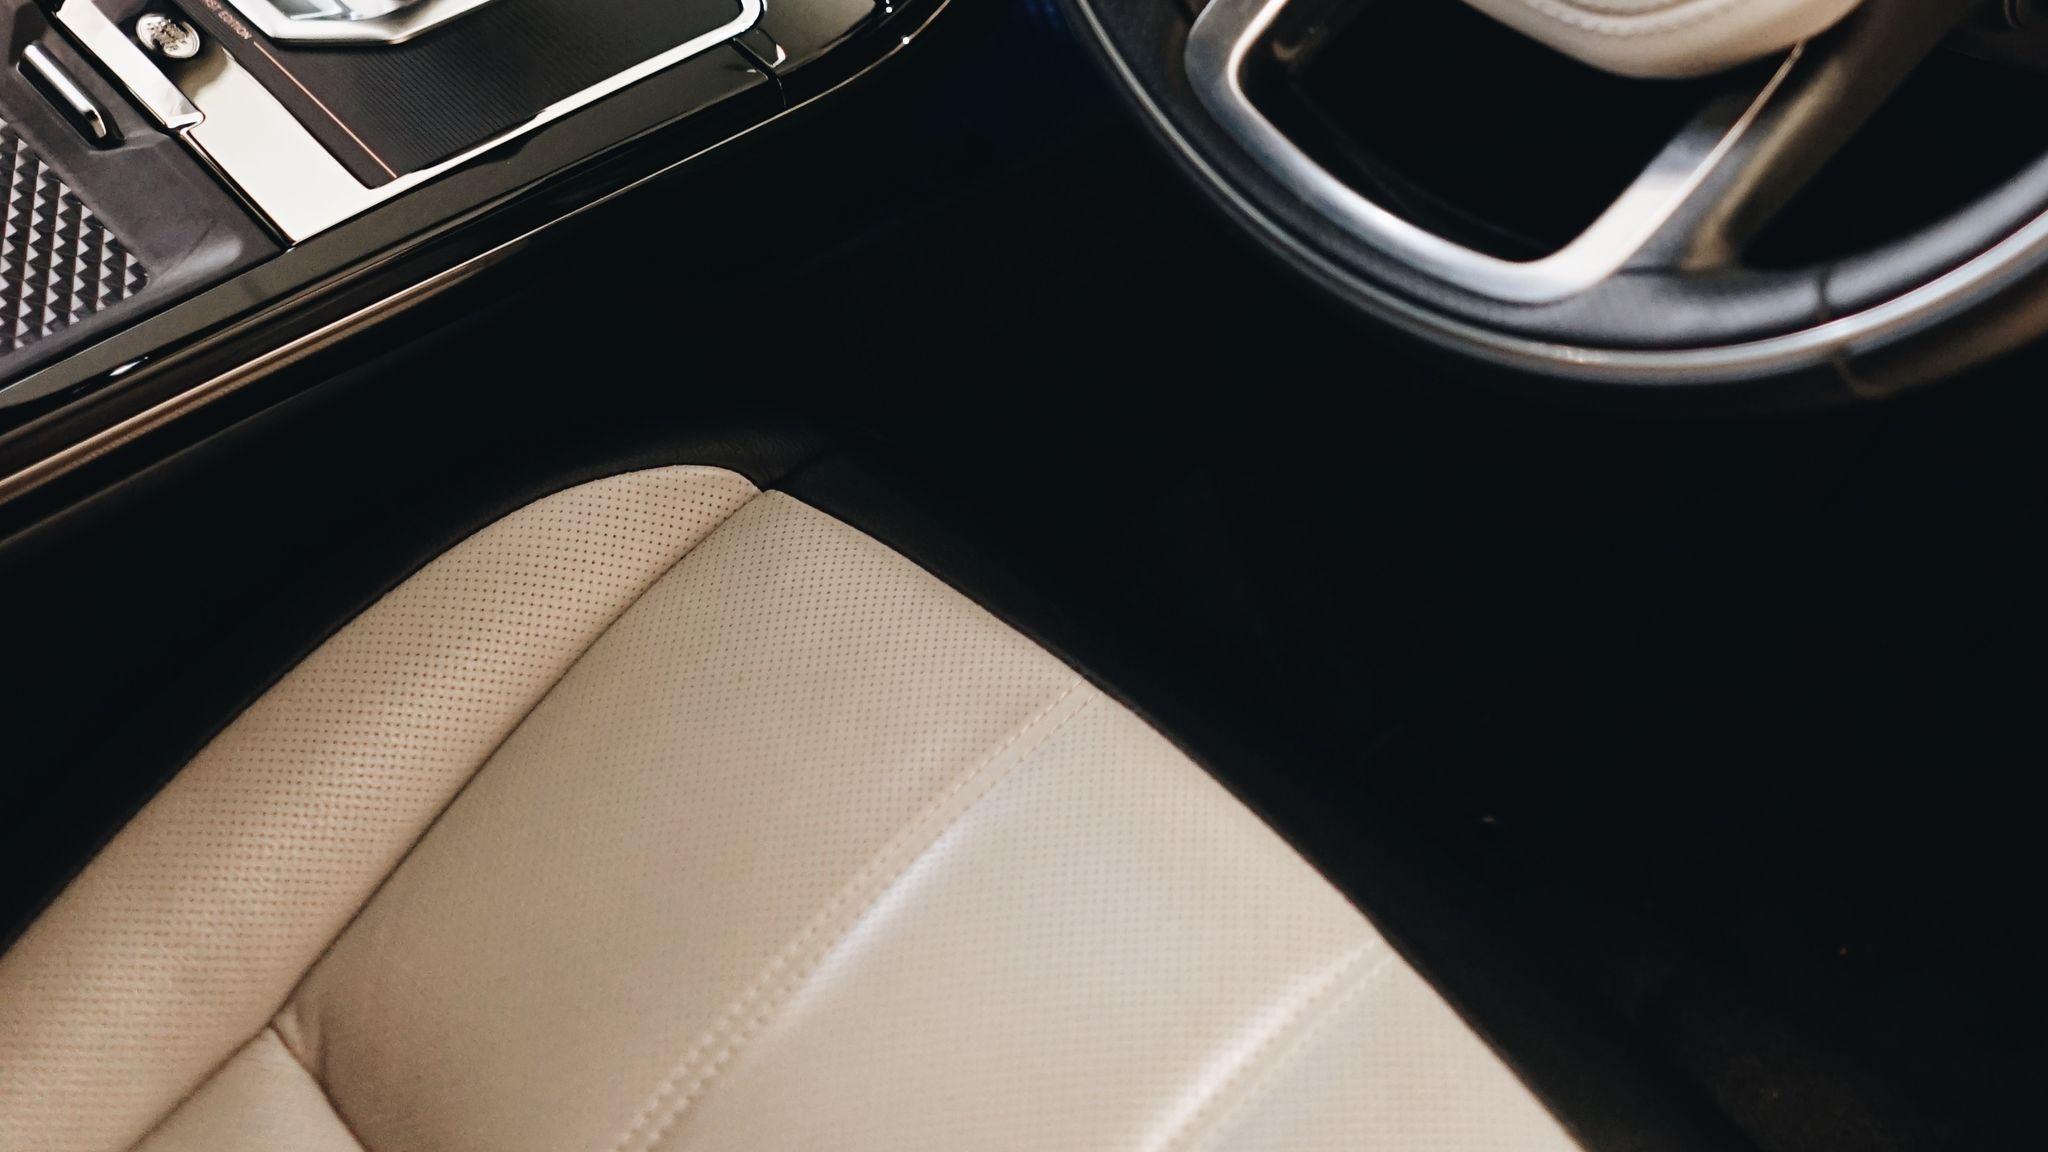 Range Rover Evoque Interior Steering Wheel